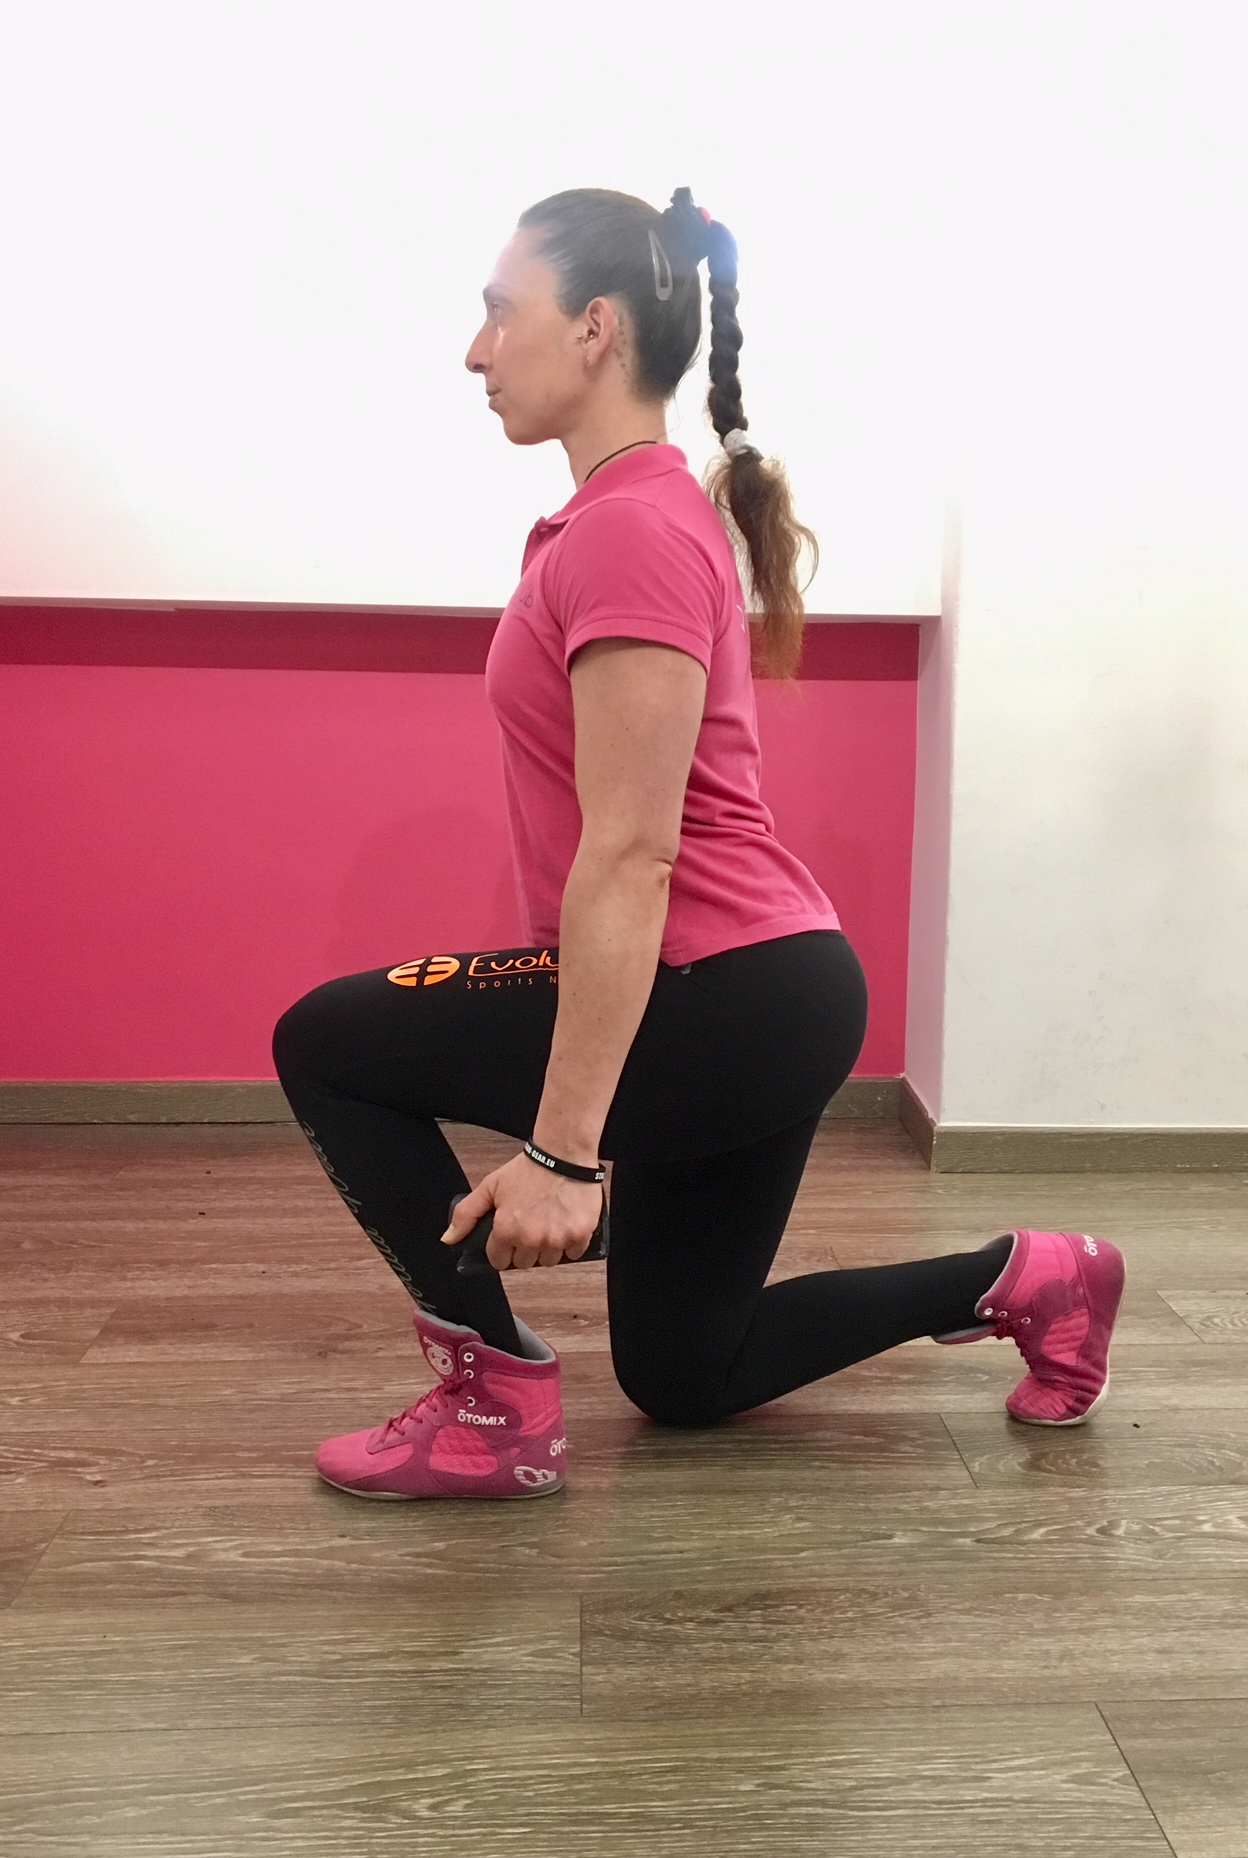 fente exercice musculation jambes ischio jambierexercice muscler jambe débutant